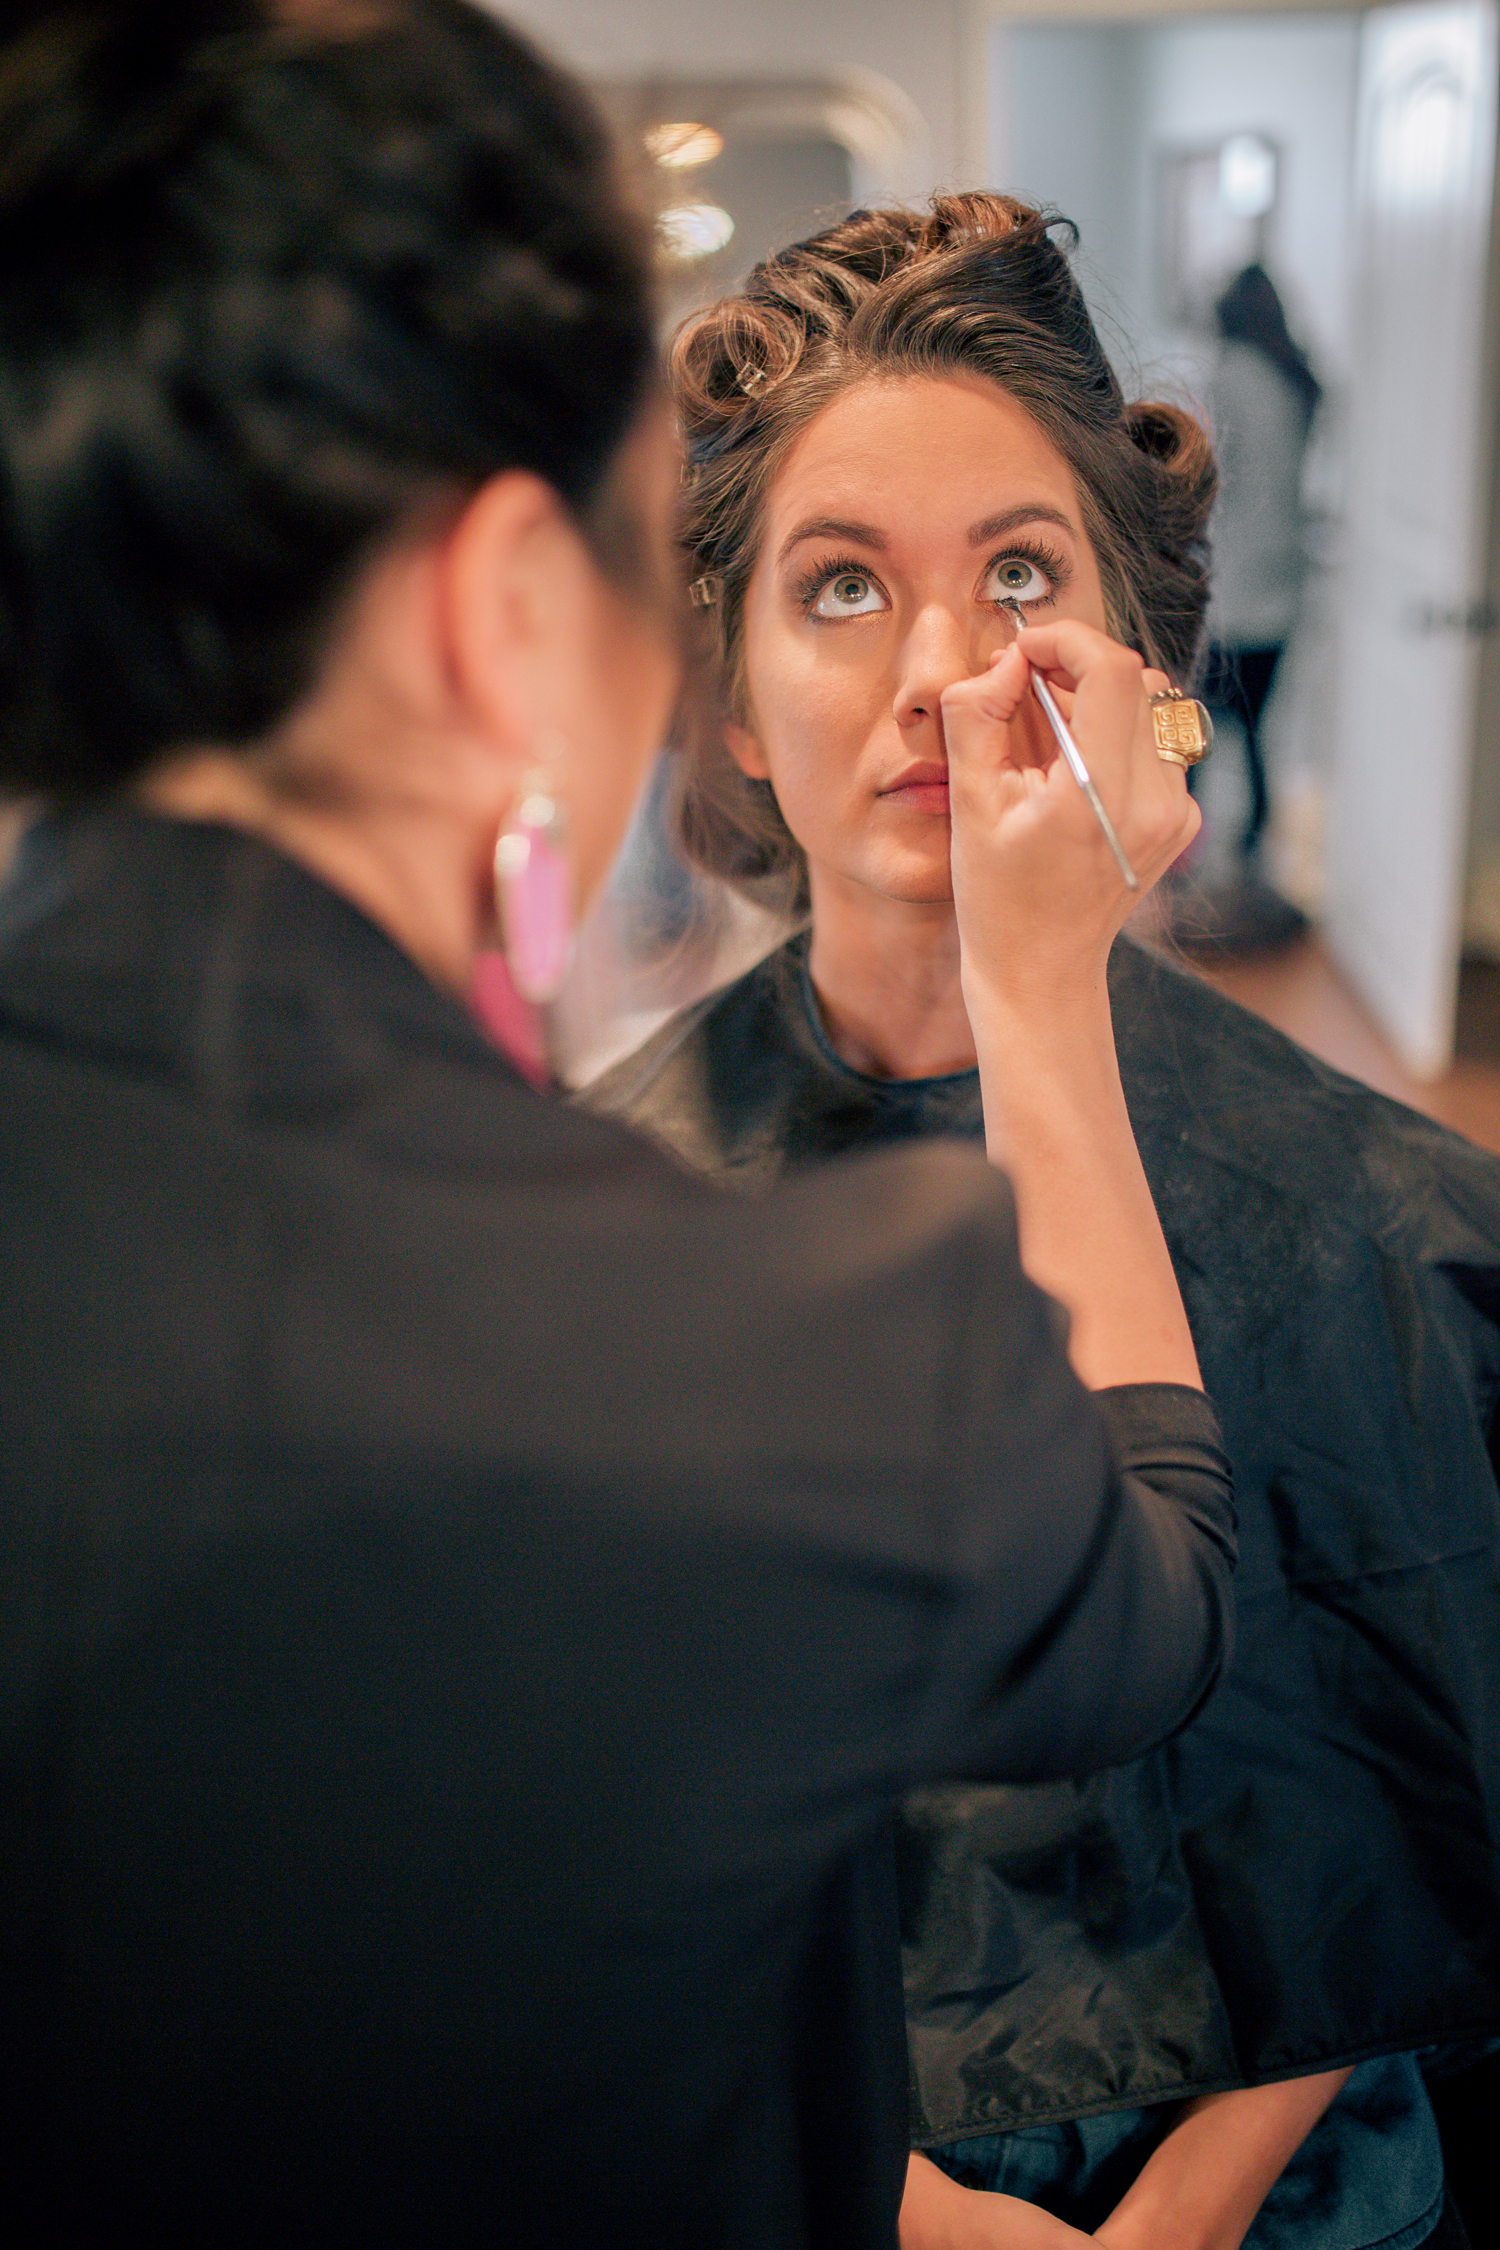 alaa-marzouk-photography-rgvweddingphotographer-rio-grande-valley-mathis-wedding-bridal-bride-san-antonio-portrait-weddings-mcallen-33.jpg